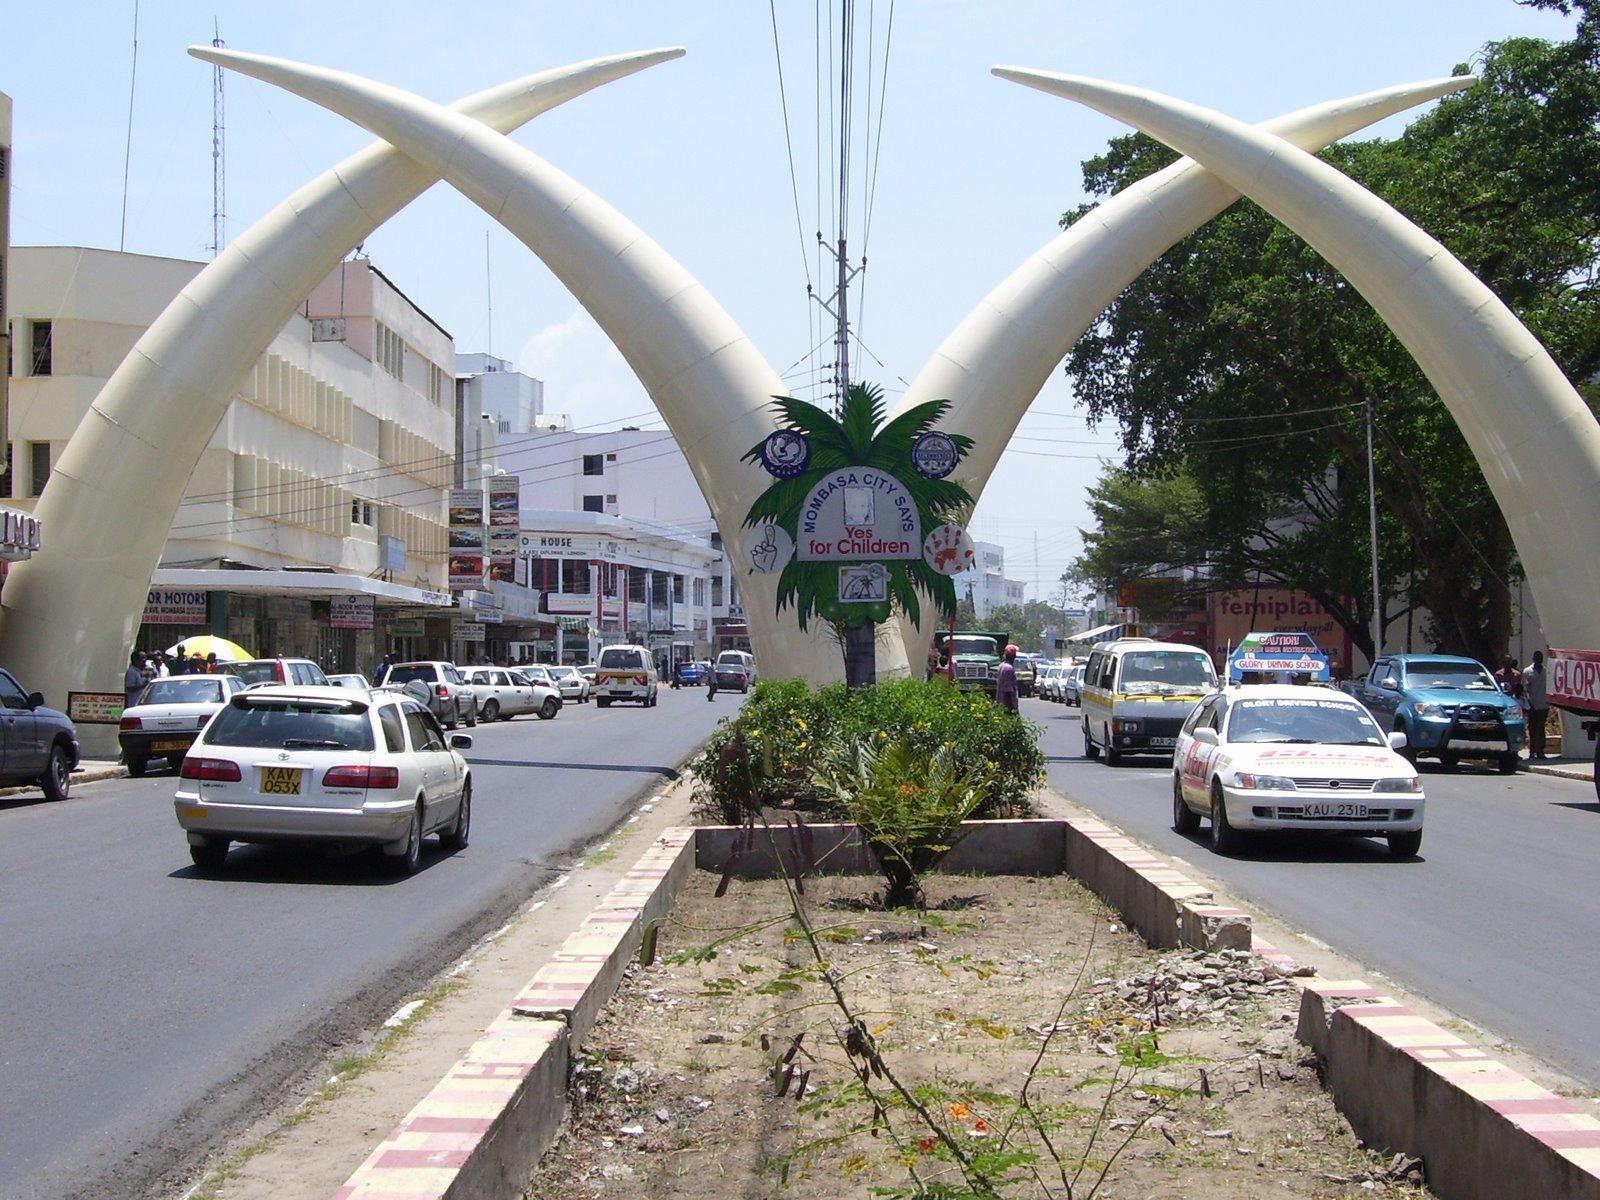 Mombasa, pic source; Hello Georgia